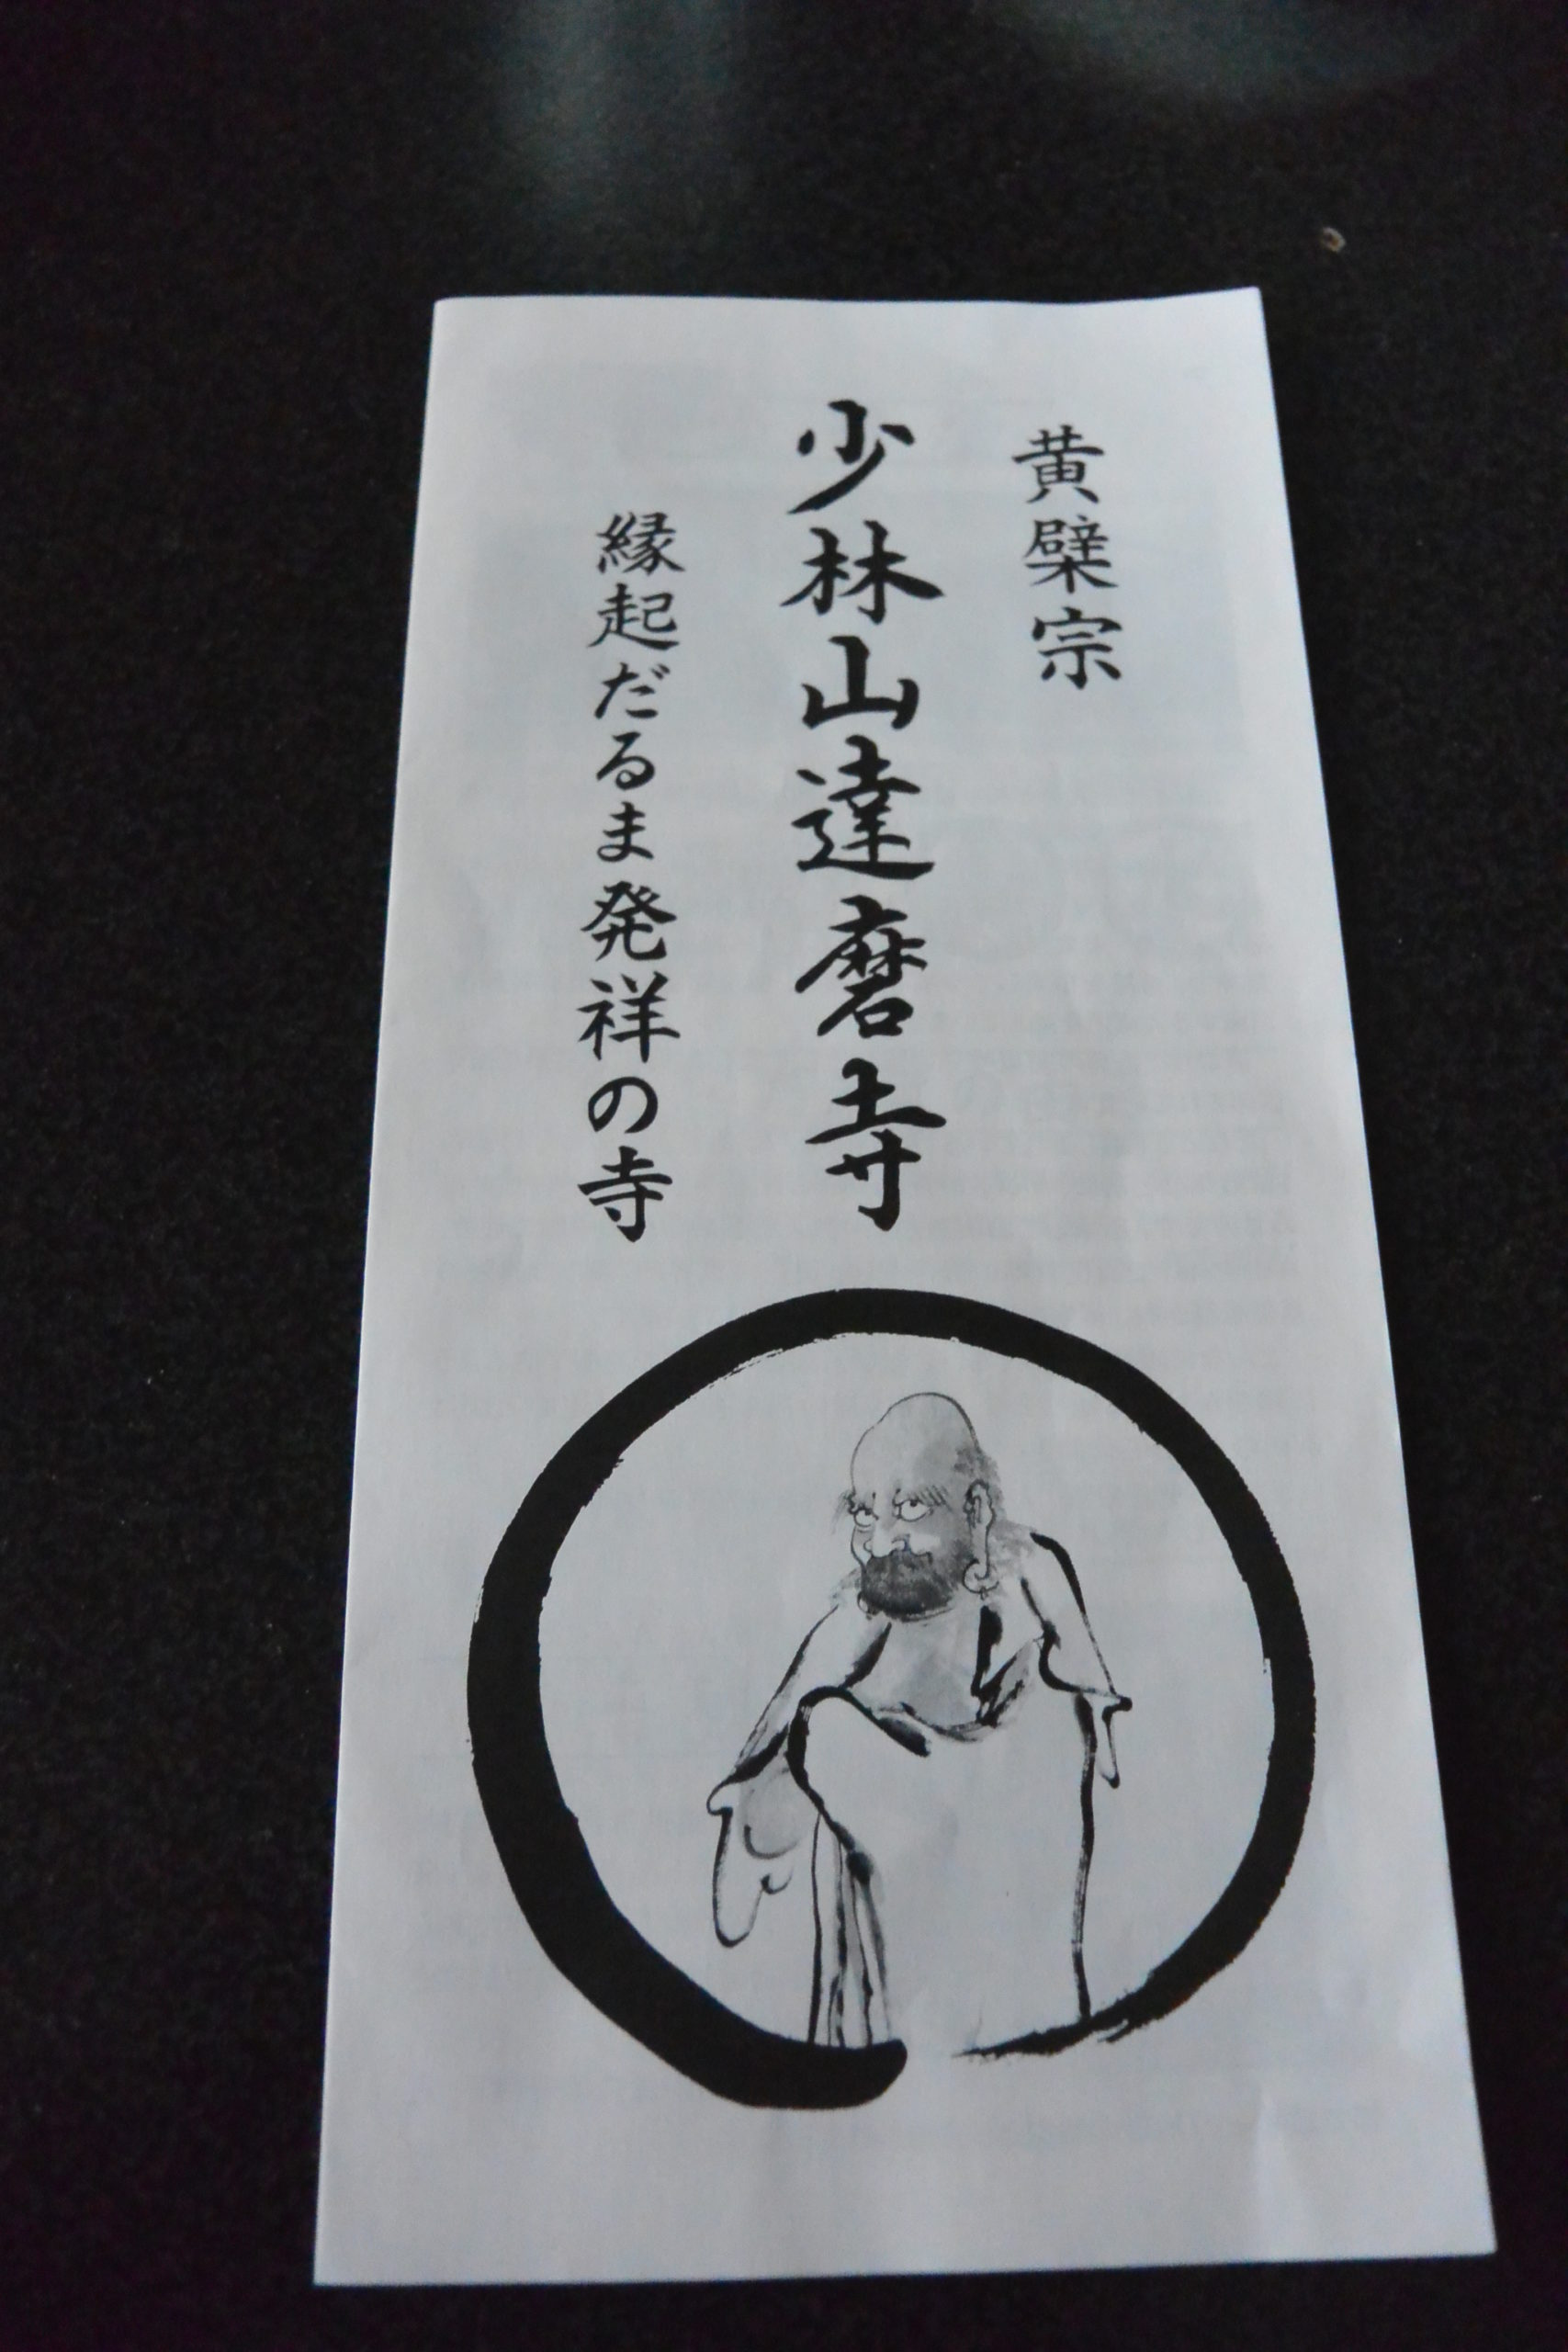 少林山達磨寺 お札